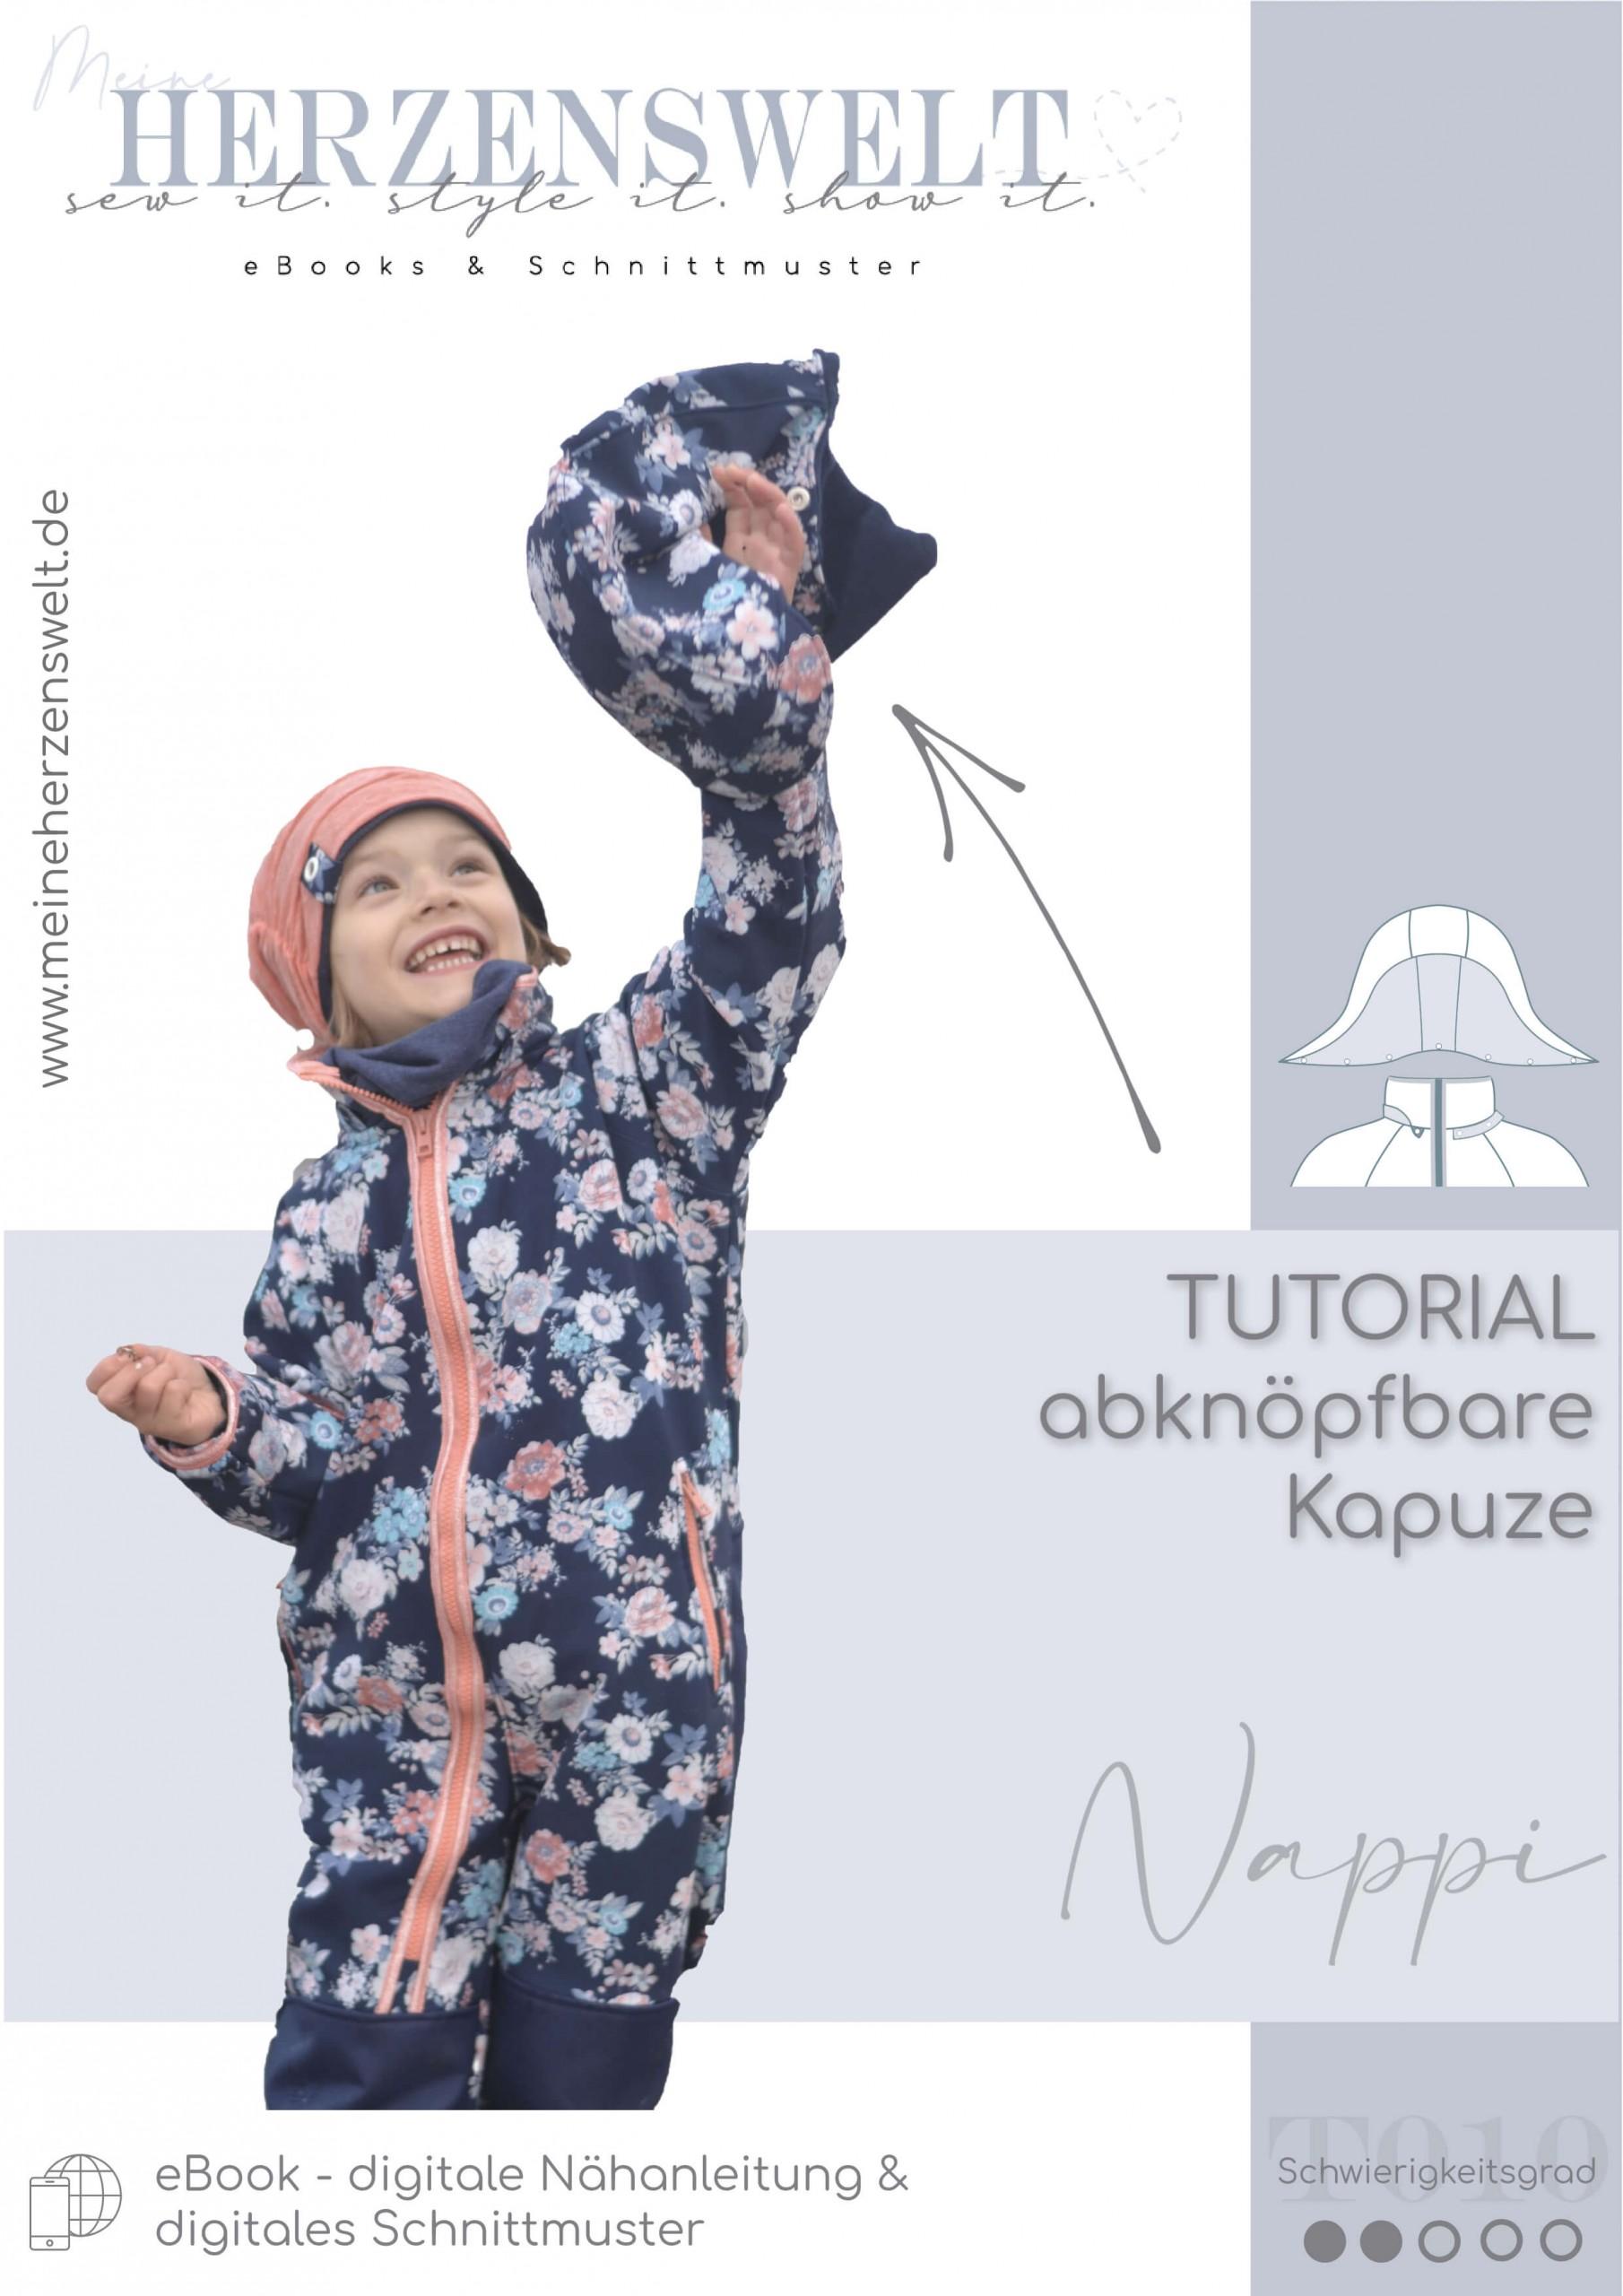 T010_ Nappi_abknöpfbare_Kapuze_Nähanleitung_Schnittmuster_meine_herzenswelt.